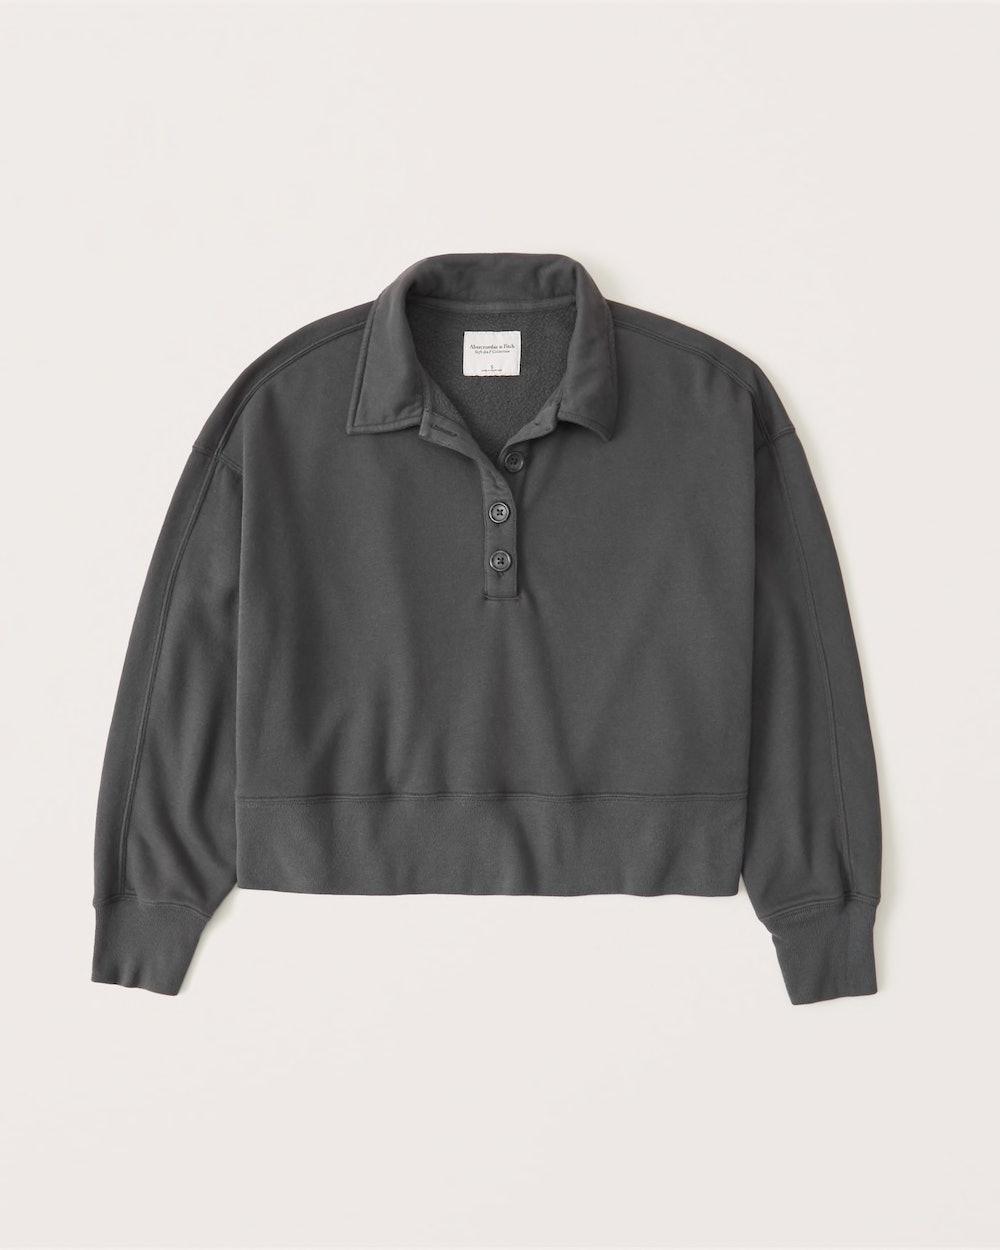 90s Sharkbite Long-Sleeve Polo Sweater